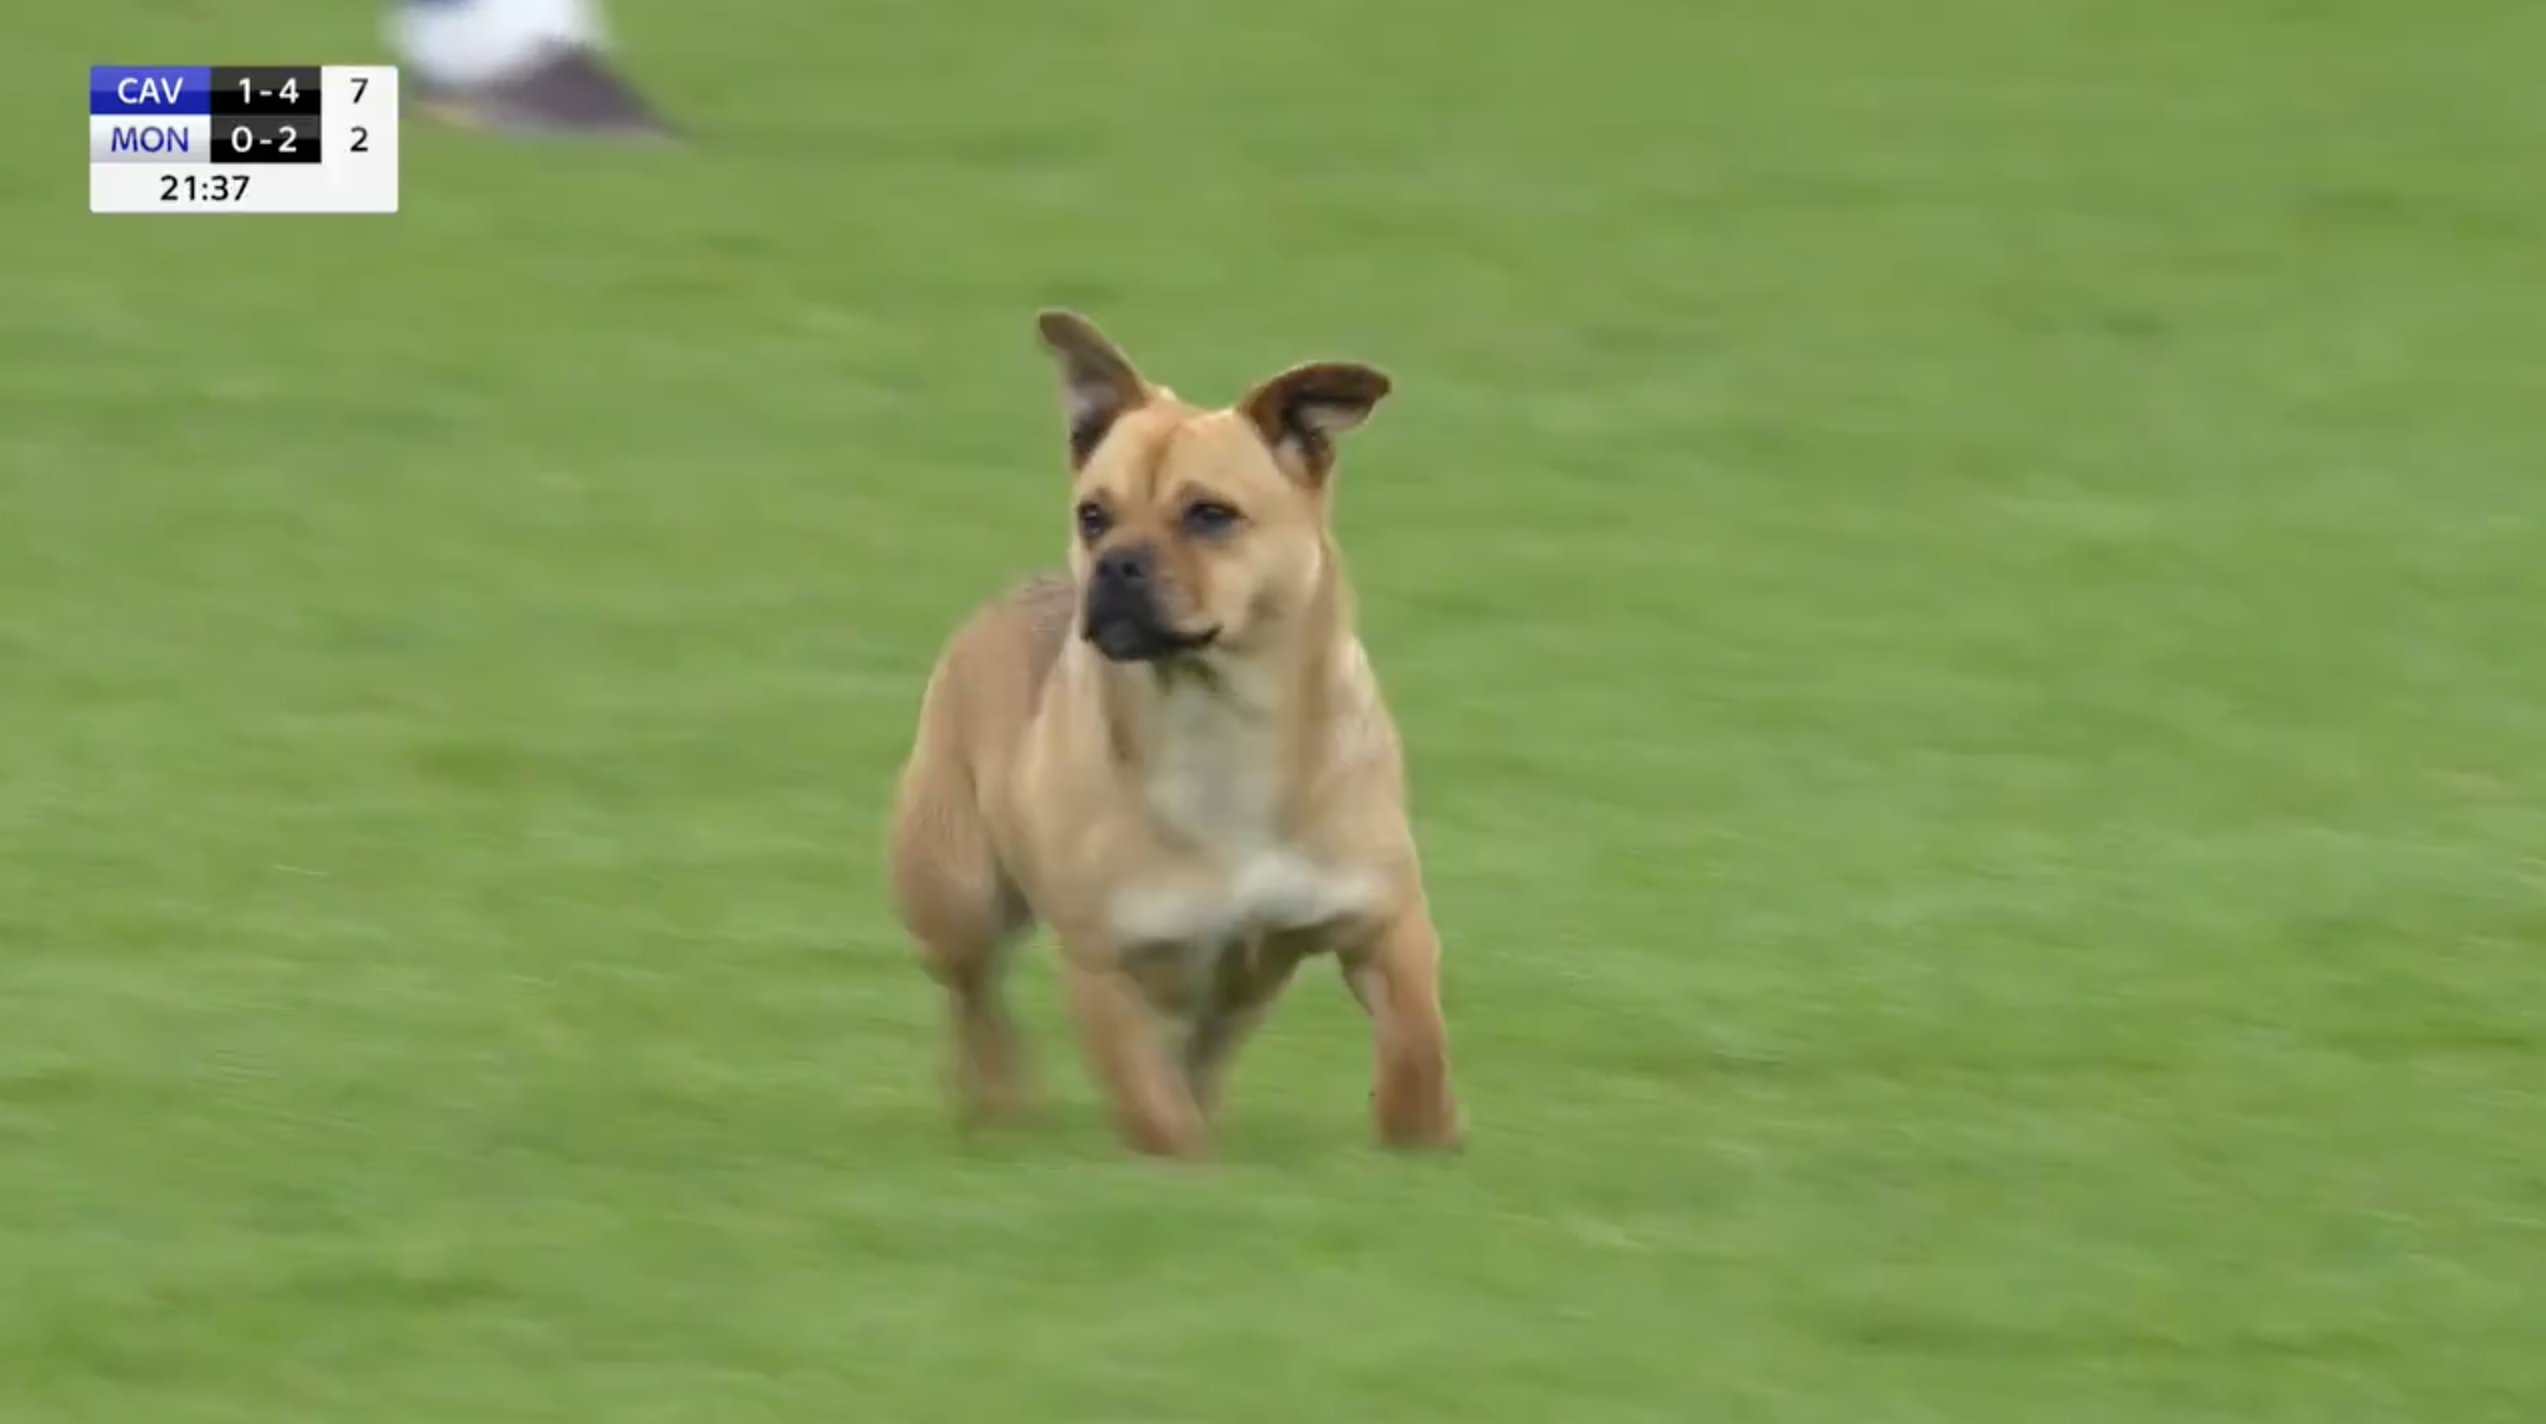 GAA: Dog on pitch at Cavan vs Monaghan game (video)